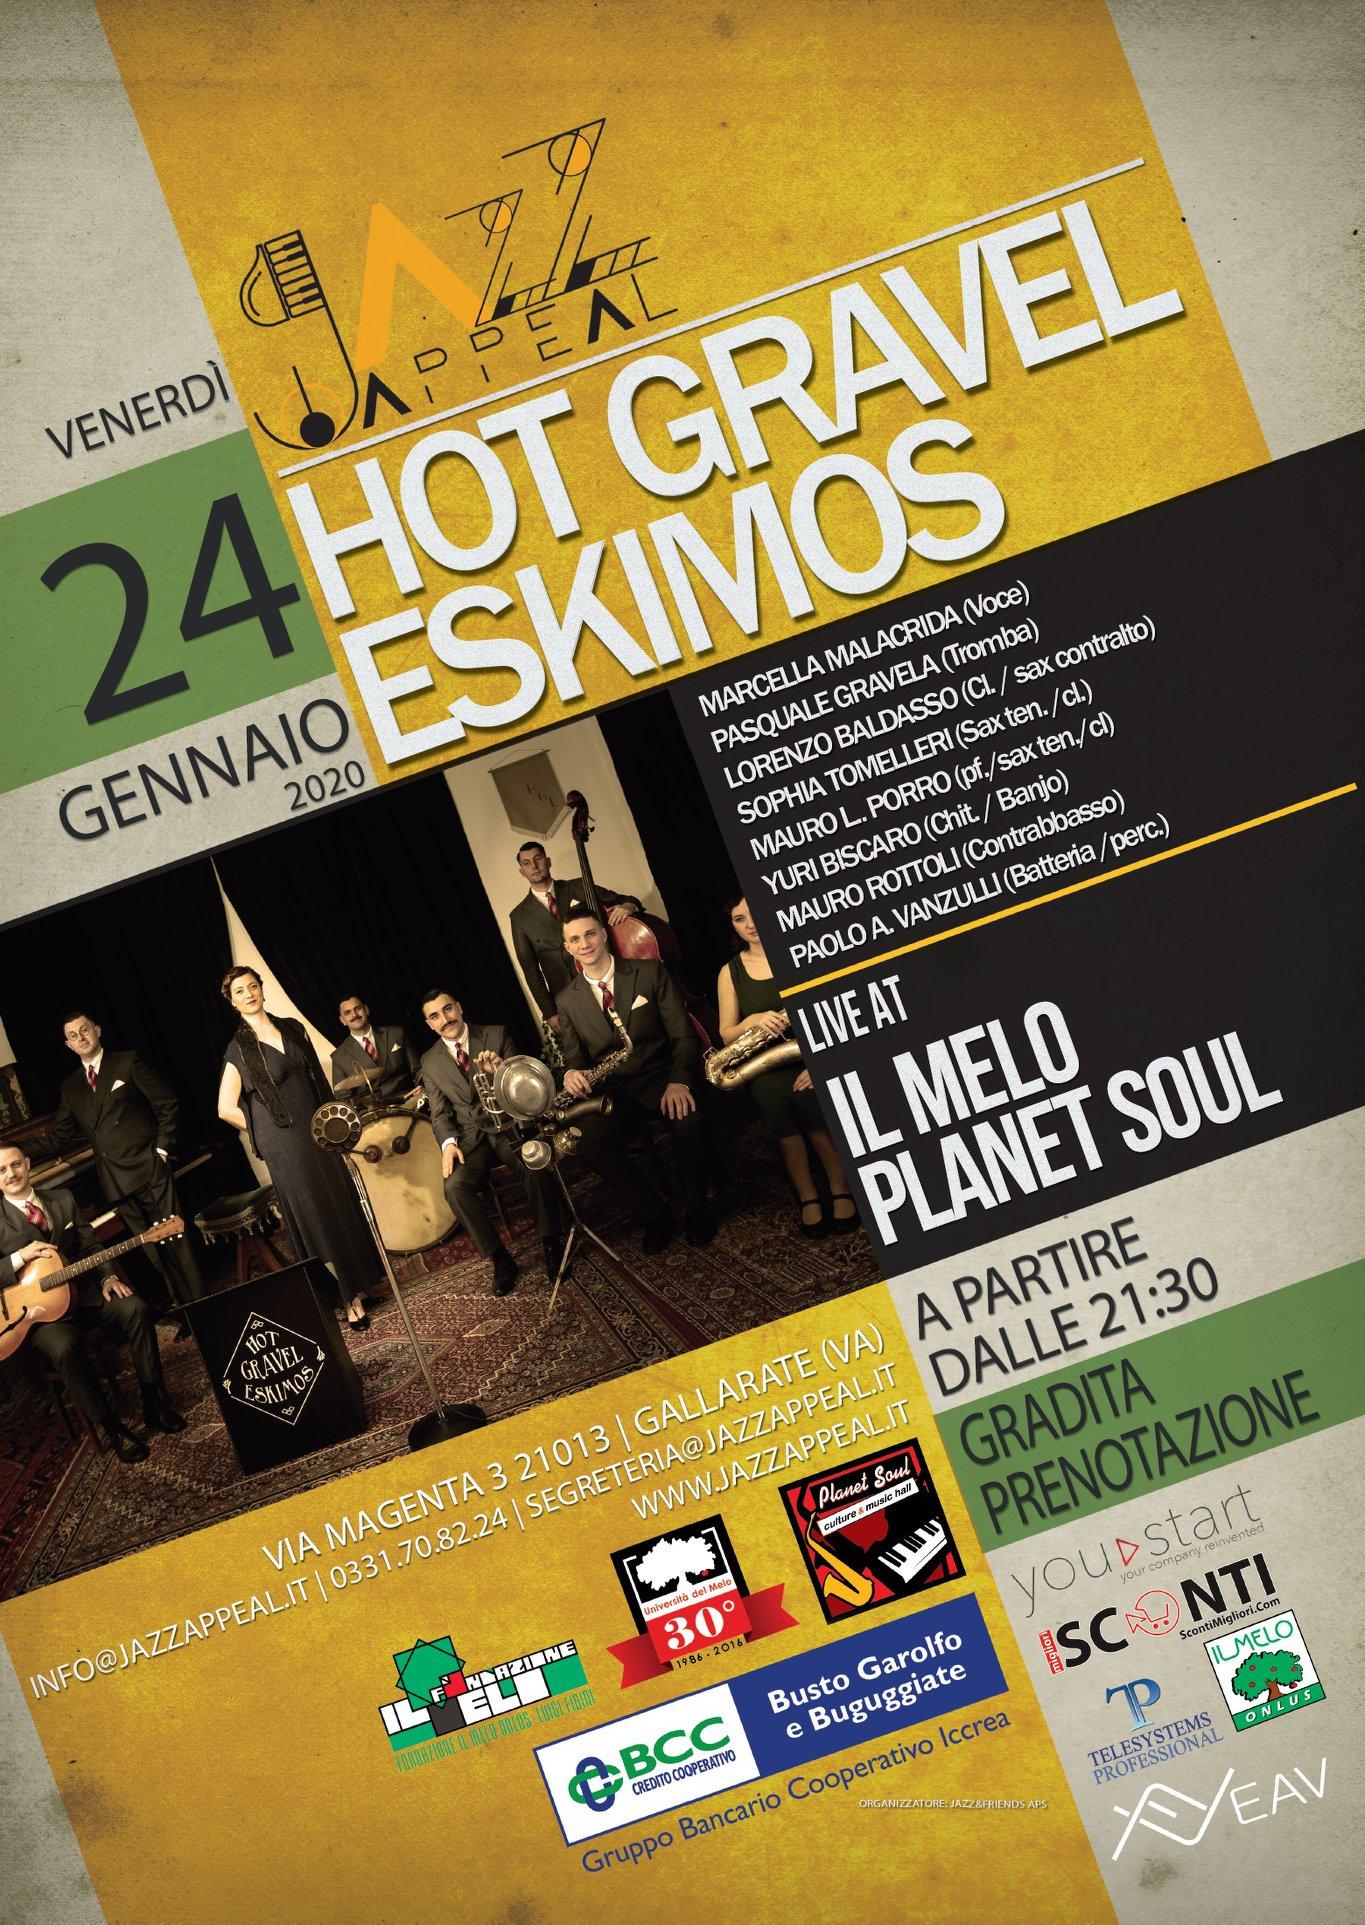 Hot Gravel Eskimos Jazz Appeal